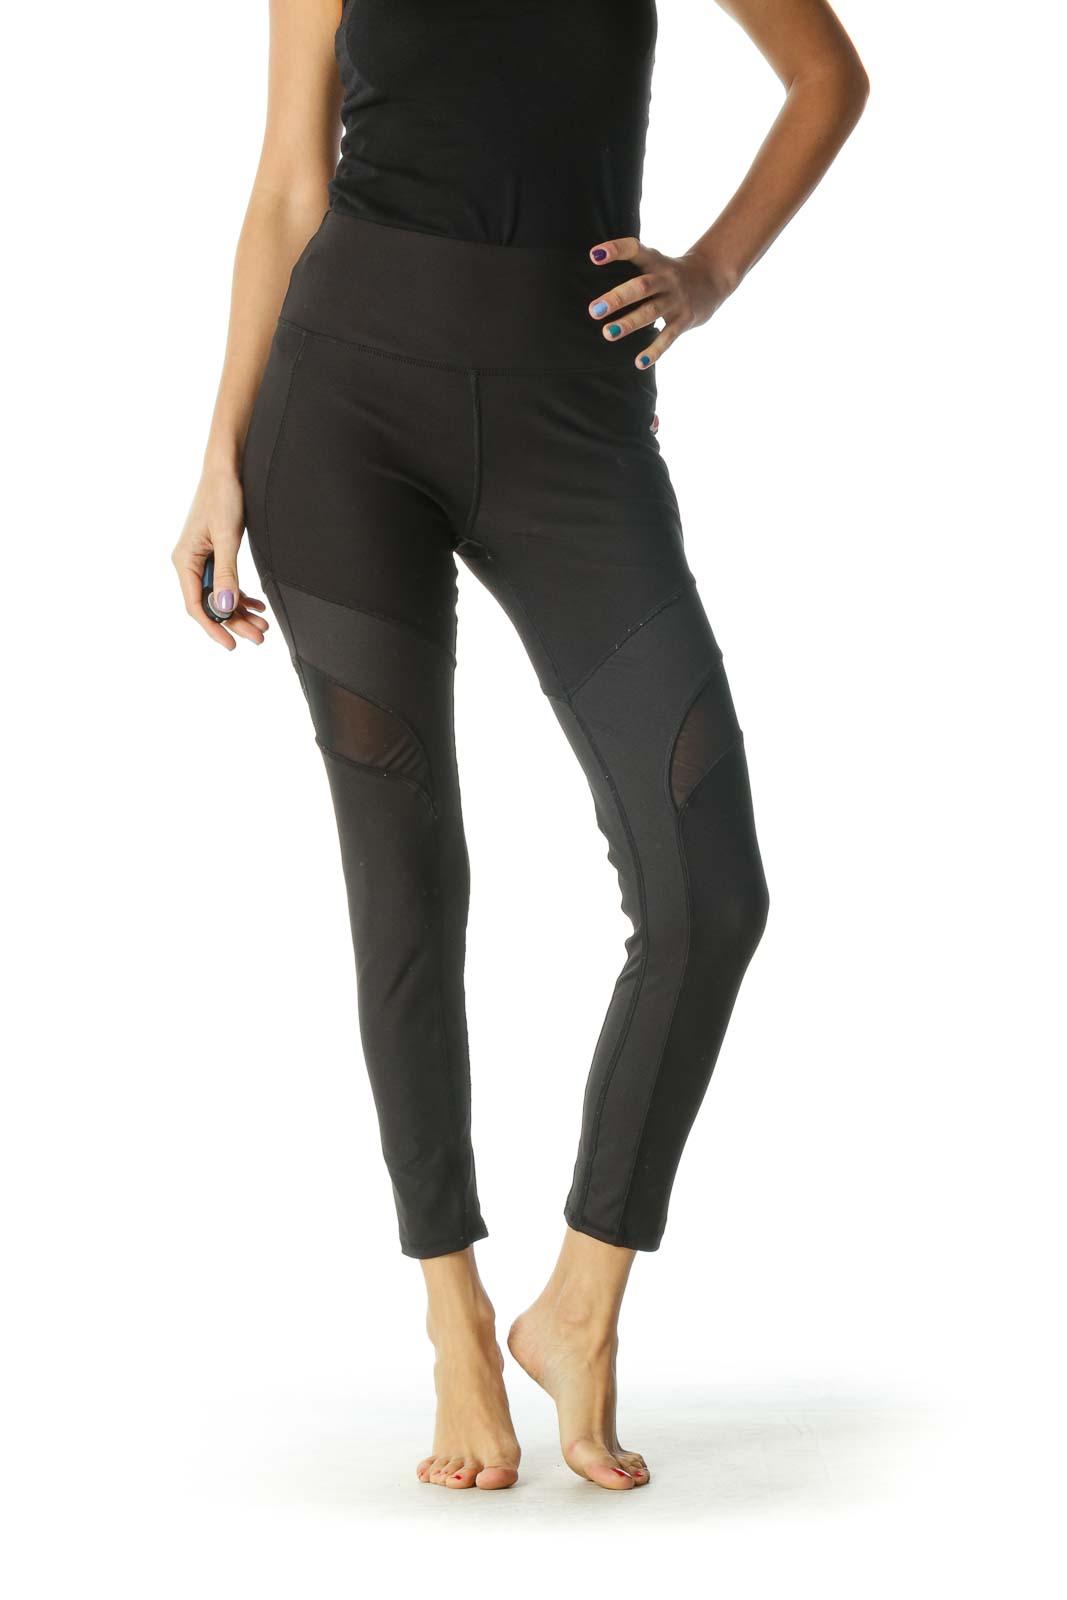 Black Mesh Paneled Leggings Front